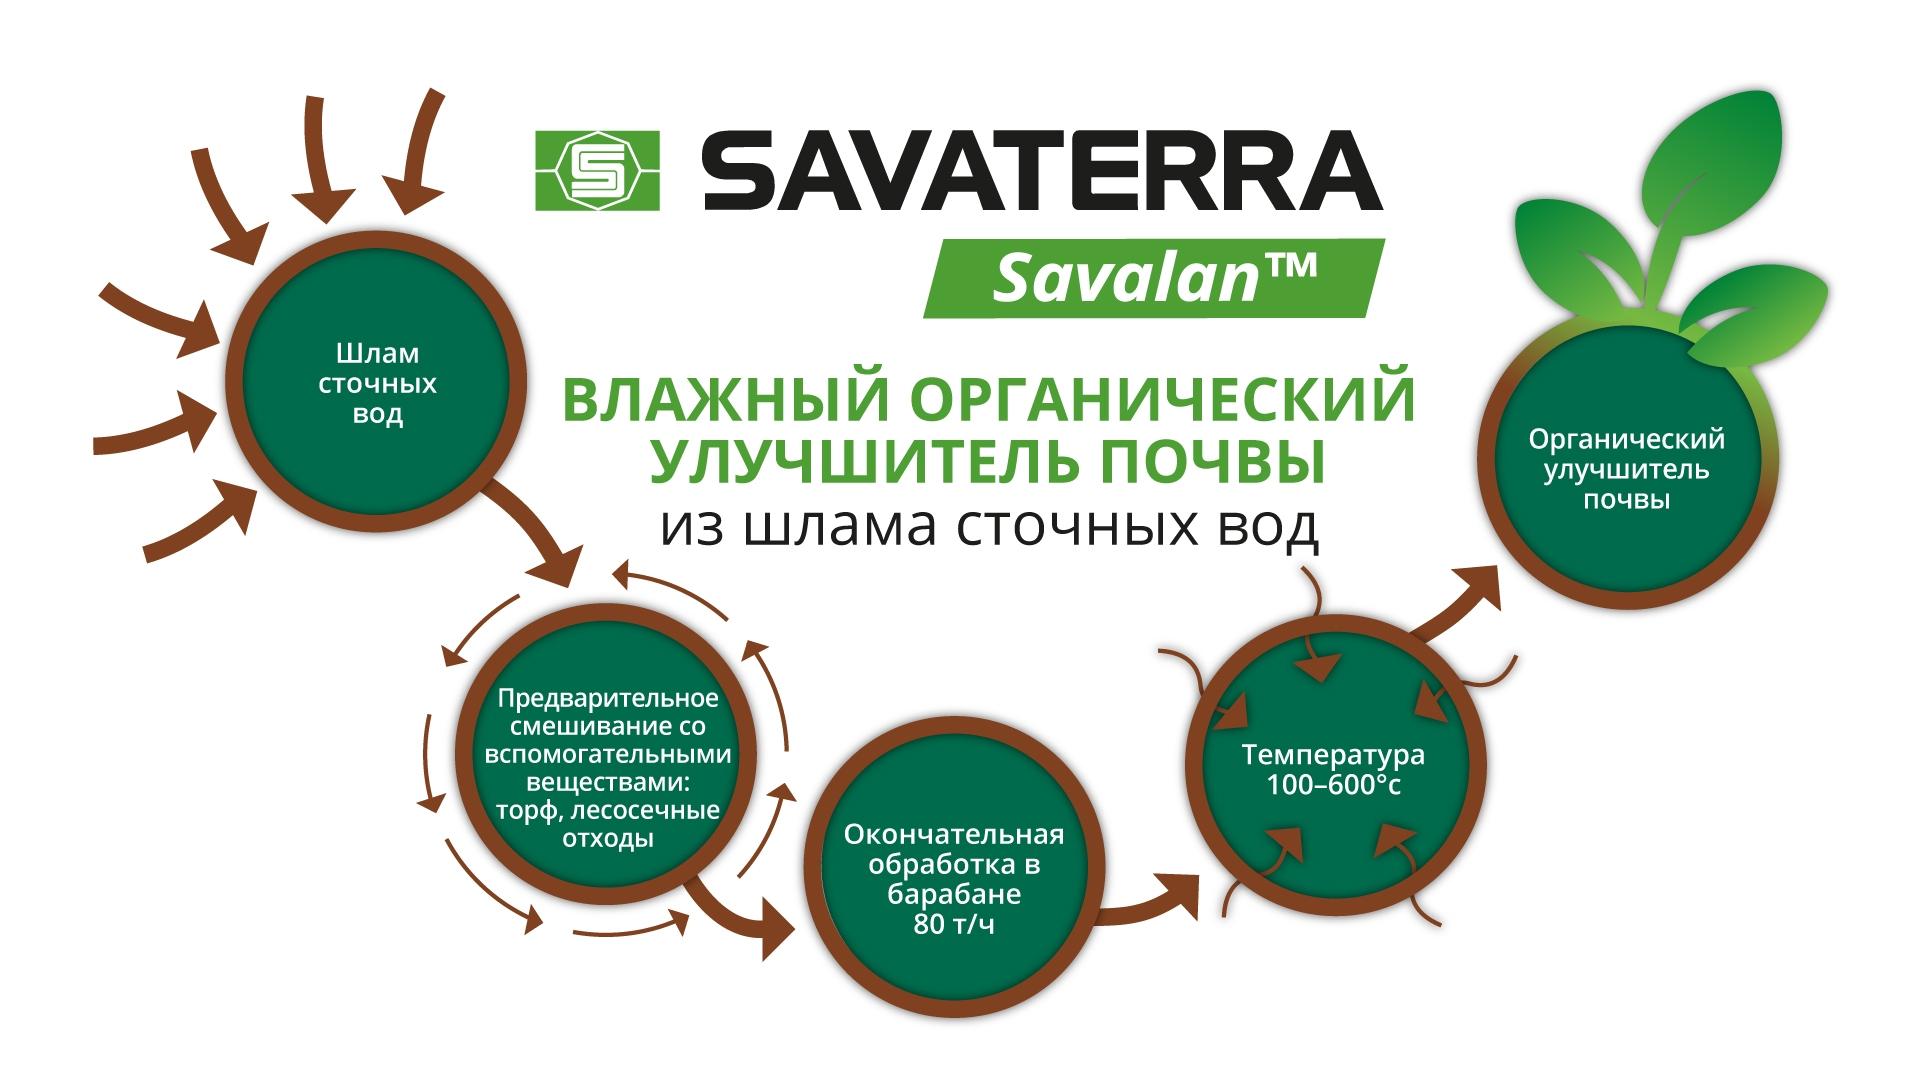 Savaterra Savalan